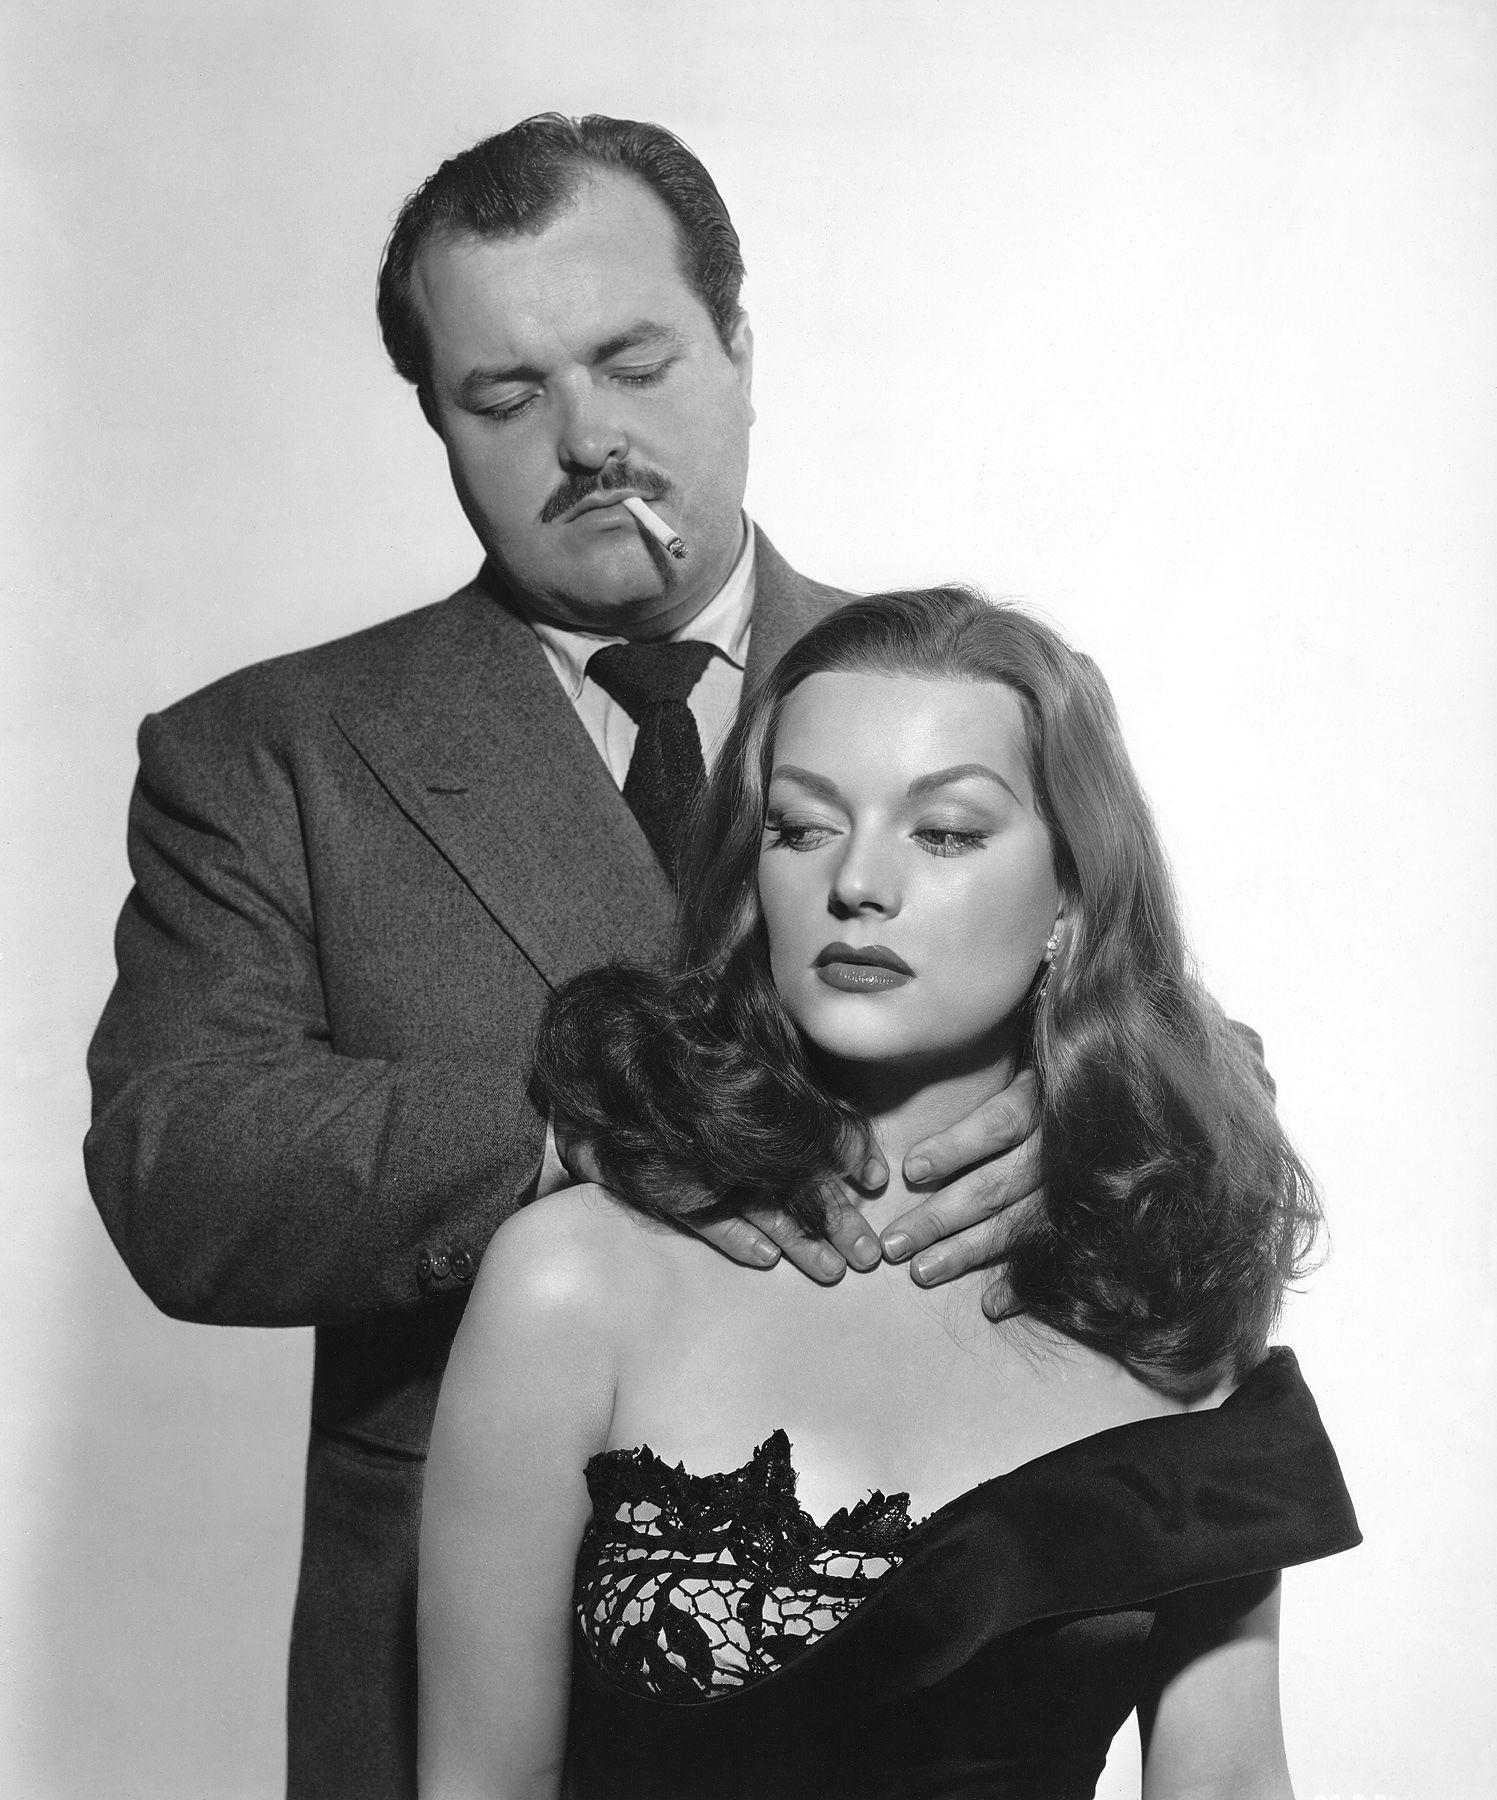 William Conrad and Hazel Brooks